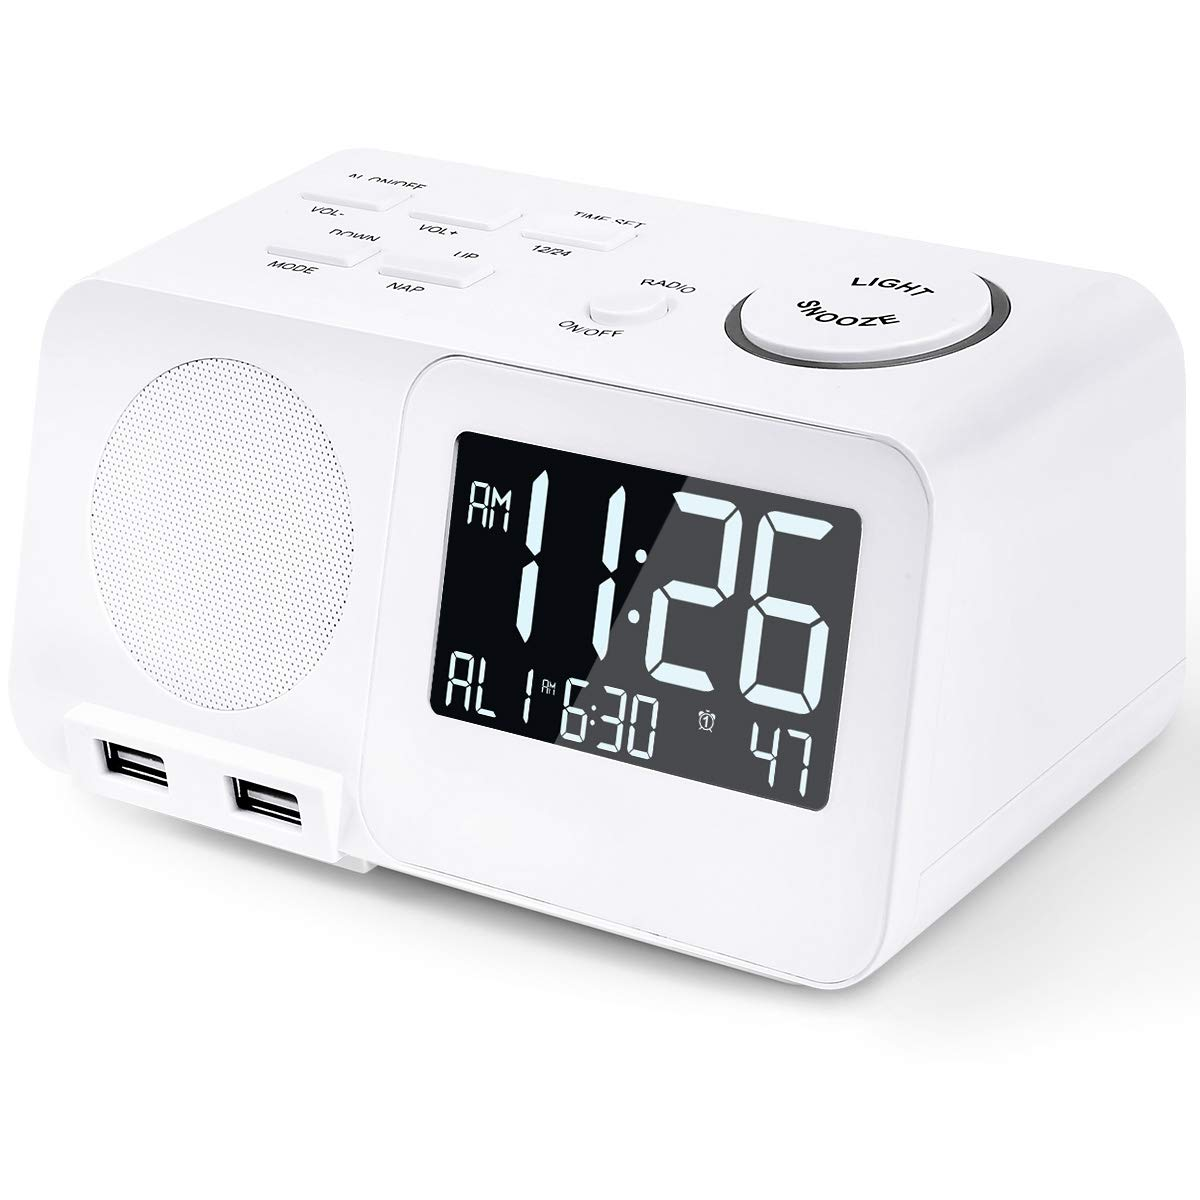 Alarm Clock Radio FM Digital Led Display Radio with USB Port Dimmer Snooze  Sleep Timer Dual Alarms for Bedroom